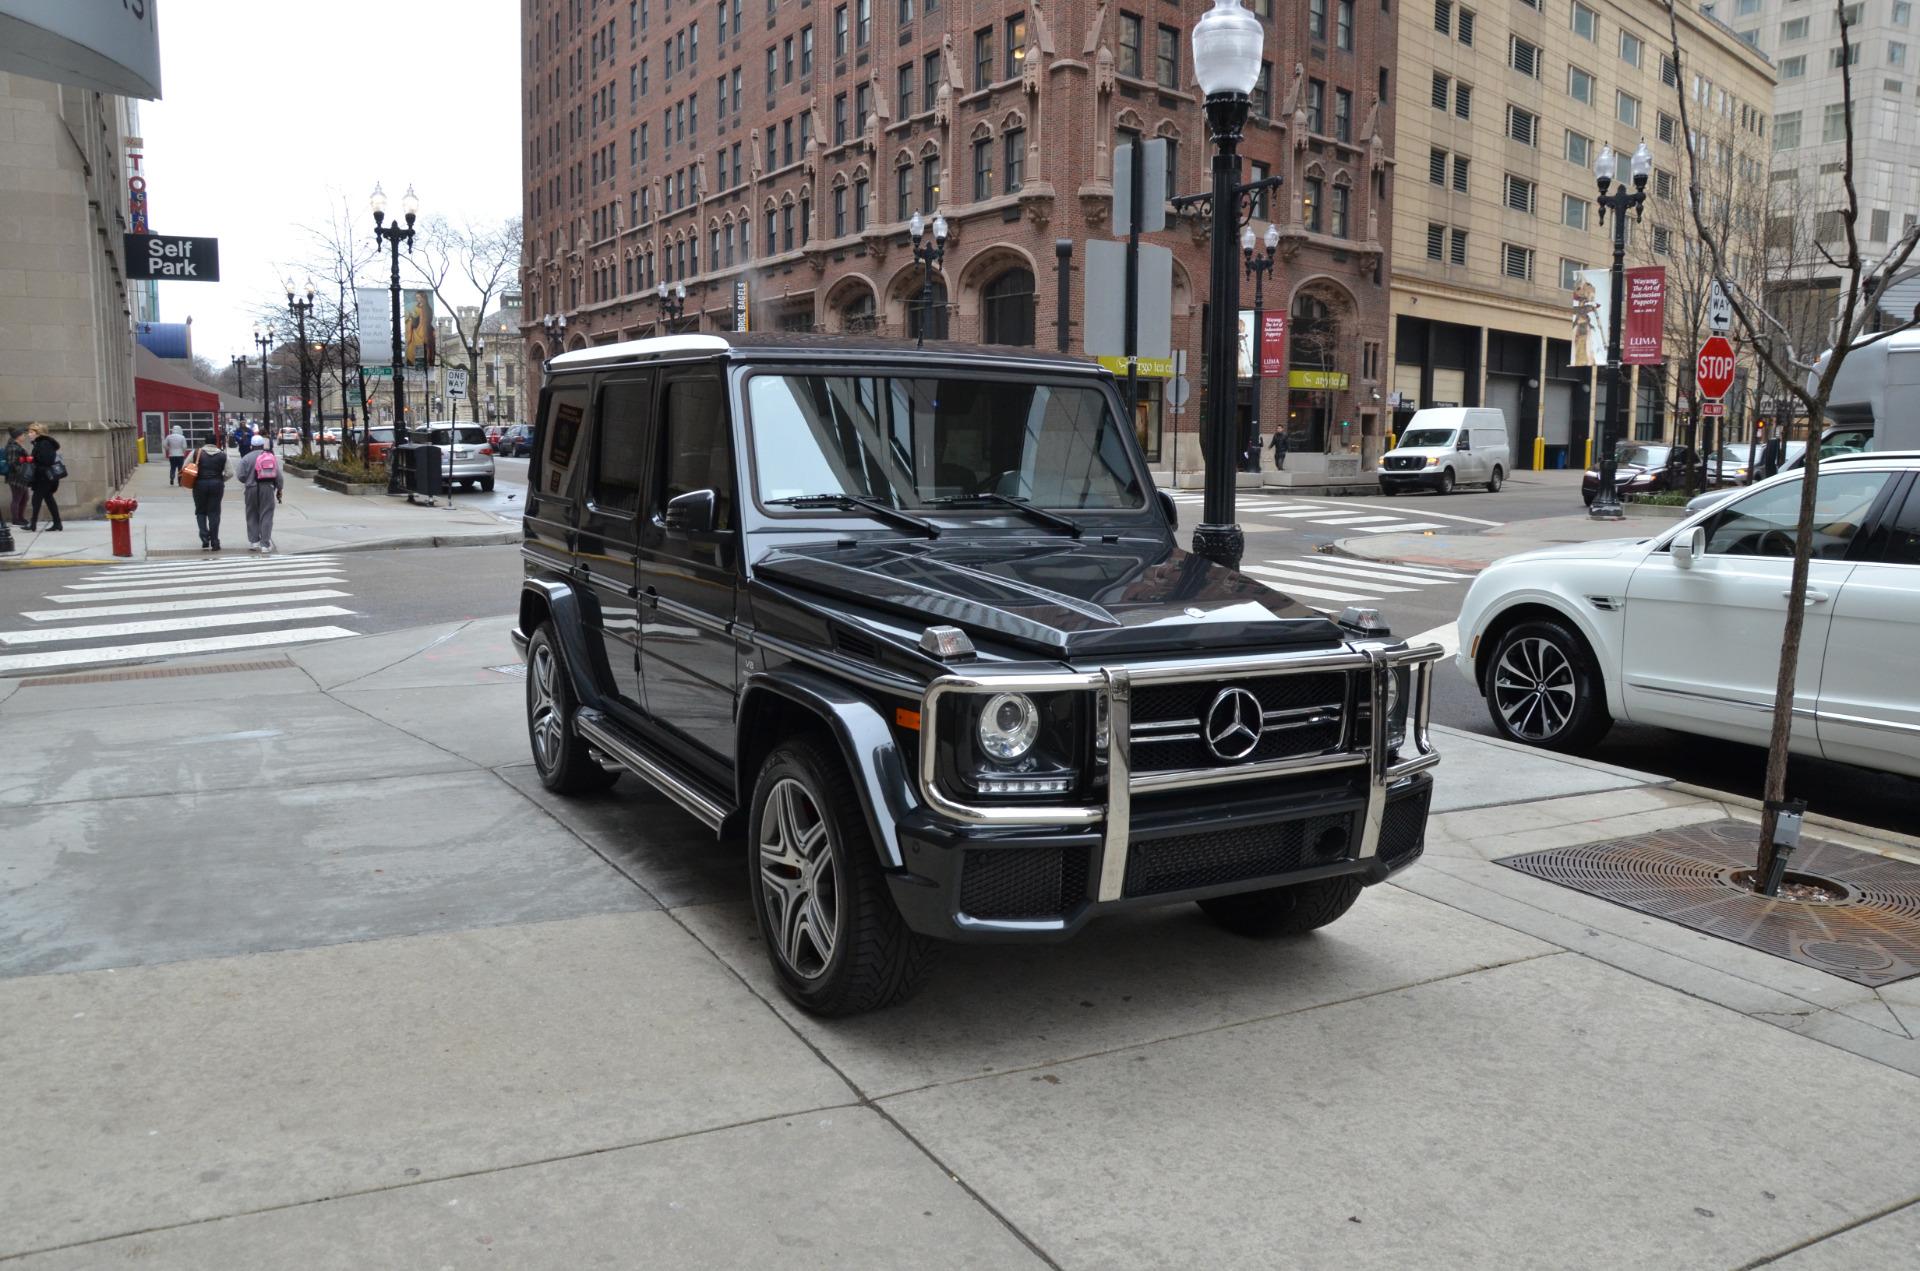 2015 mercedes benz g class g 63 amg stock b889a for sale for Mercedes benz dealer chicago